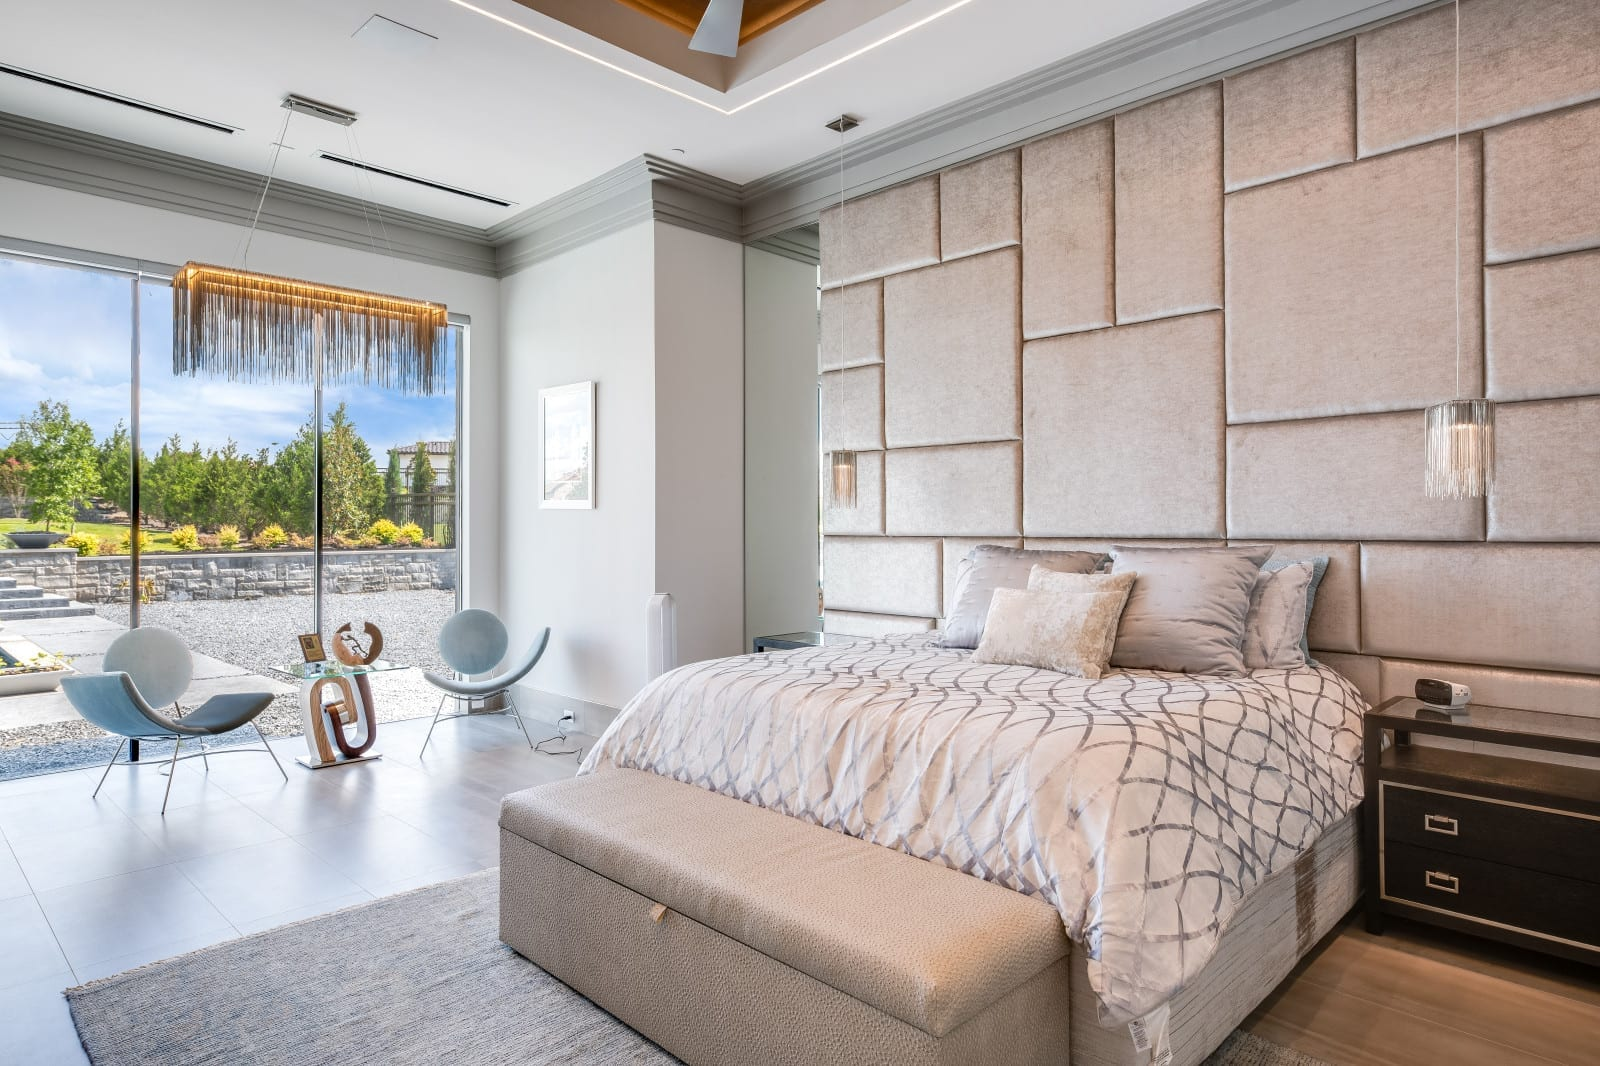 Custom Home Build and Interior Design # 35 - Millennial Design + Build, Home Builders in Dallas Texas, modern style homes, and custom home builders in DFW